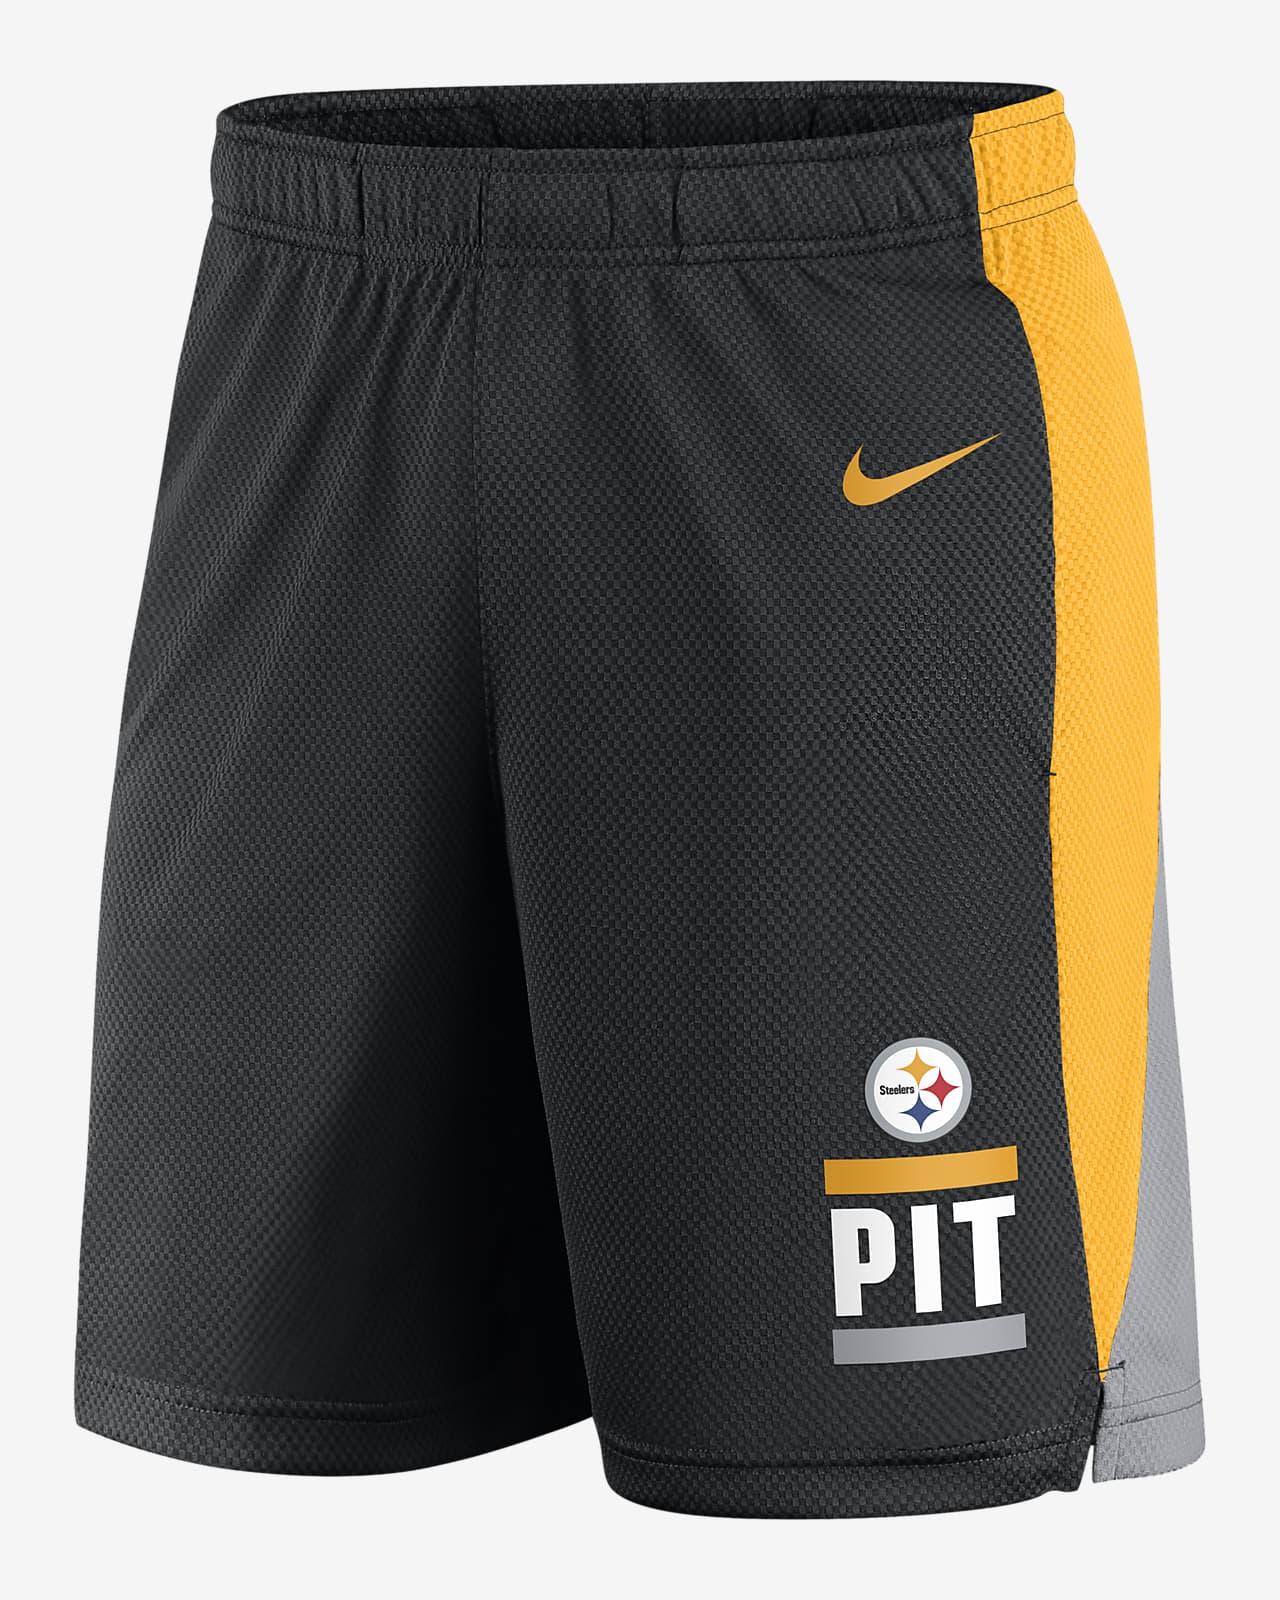 Nike Dri-FIT Broadcast (NFL Pittsburgh Steelers) Men's Shorts